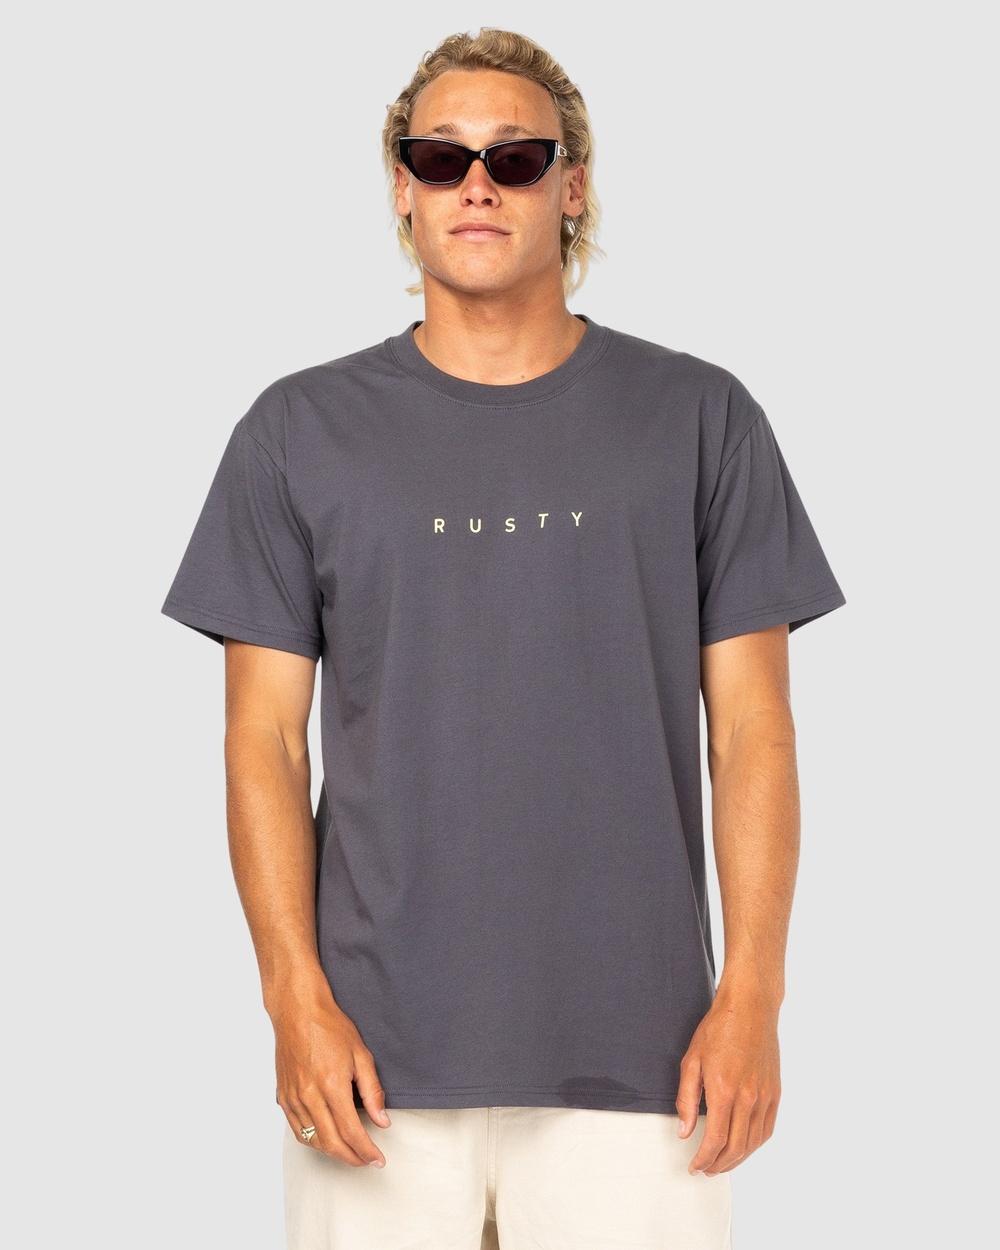 Rusty Short Cut Sleeve Tee T-Shirts COA Australia